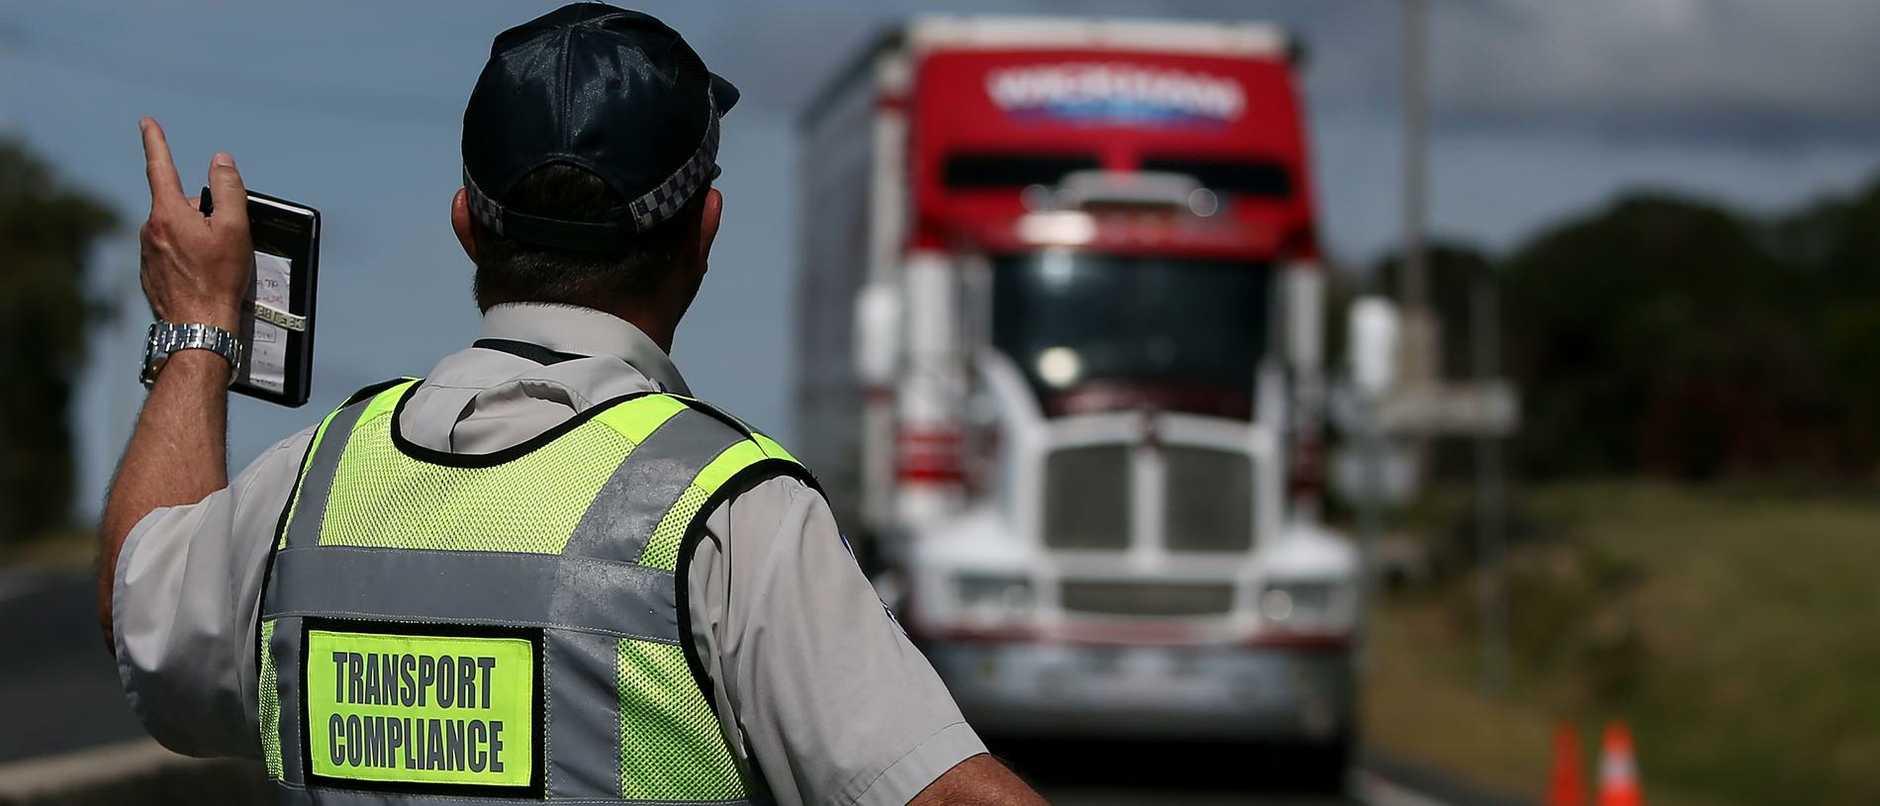 Hundreds Cross Queensland Border Ahead Of Tighter Coronavirus Restrictions